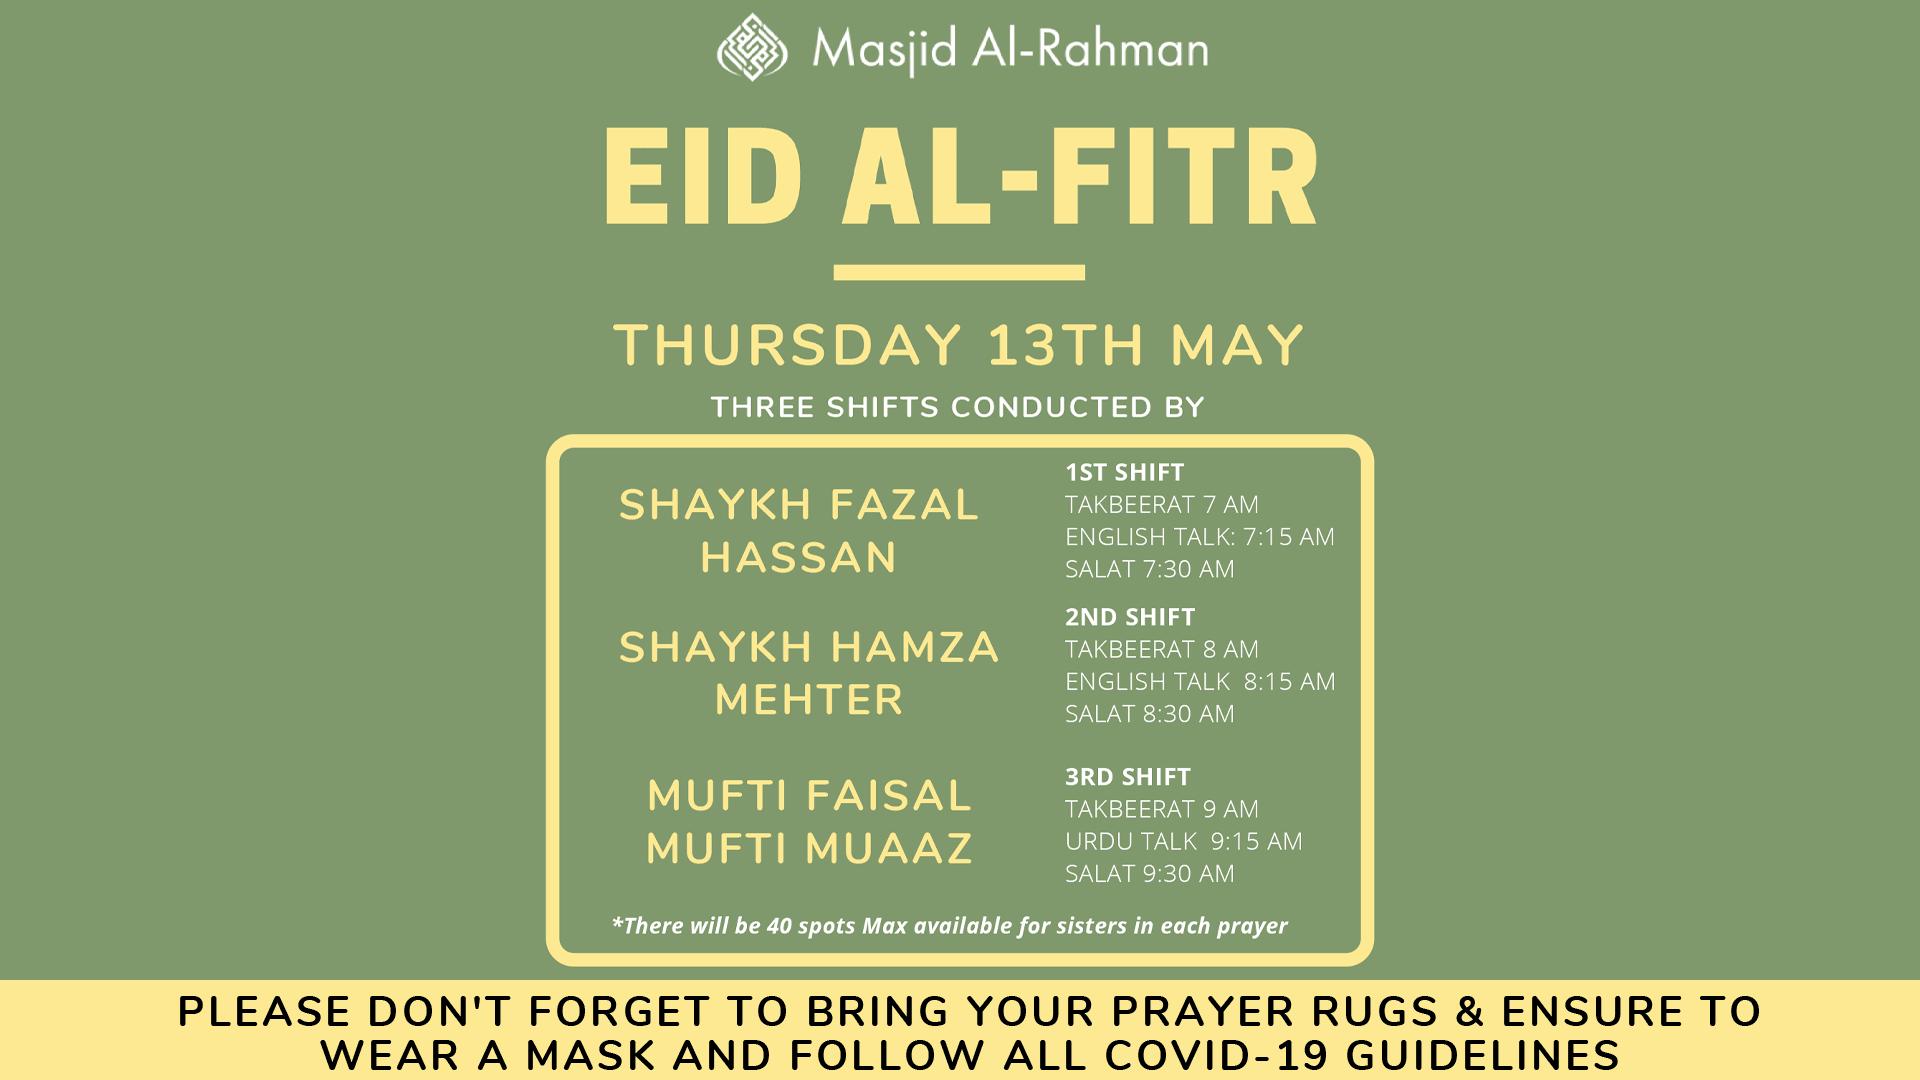 Eid Al-Fitr 2021